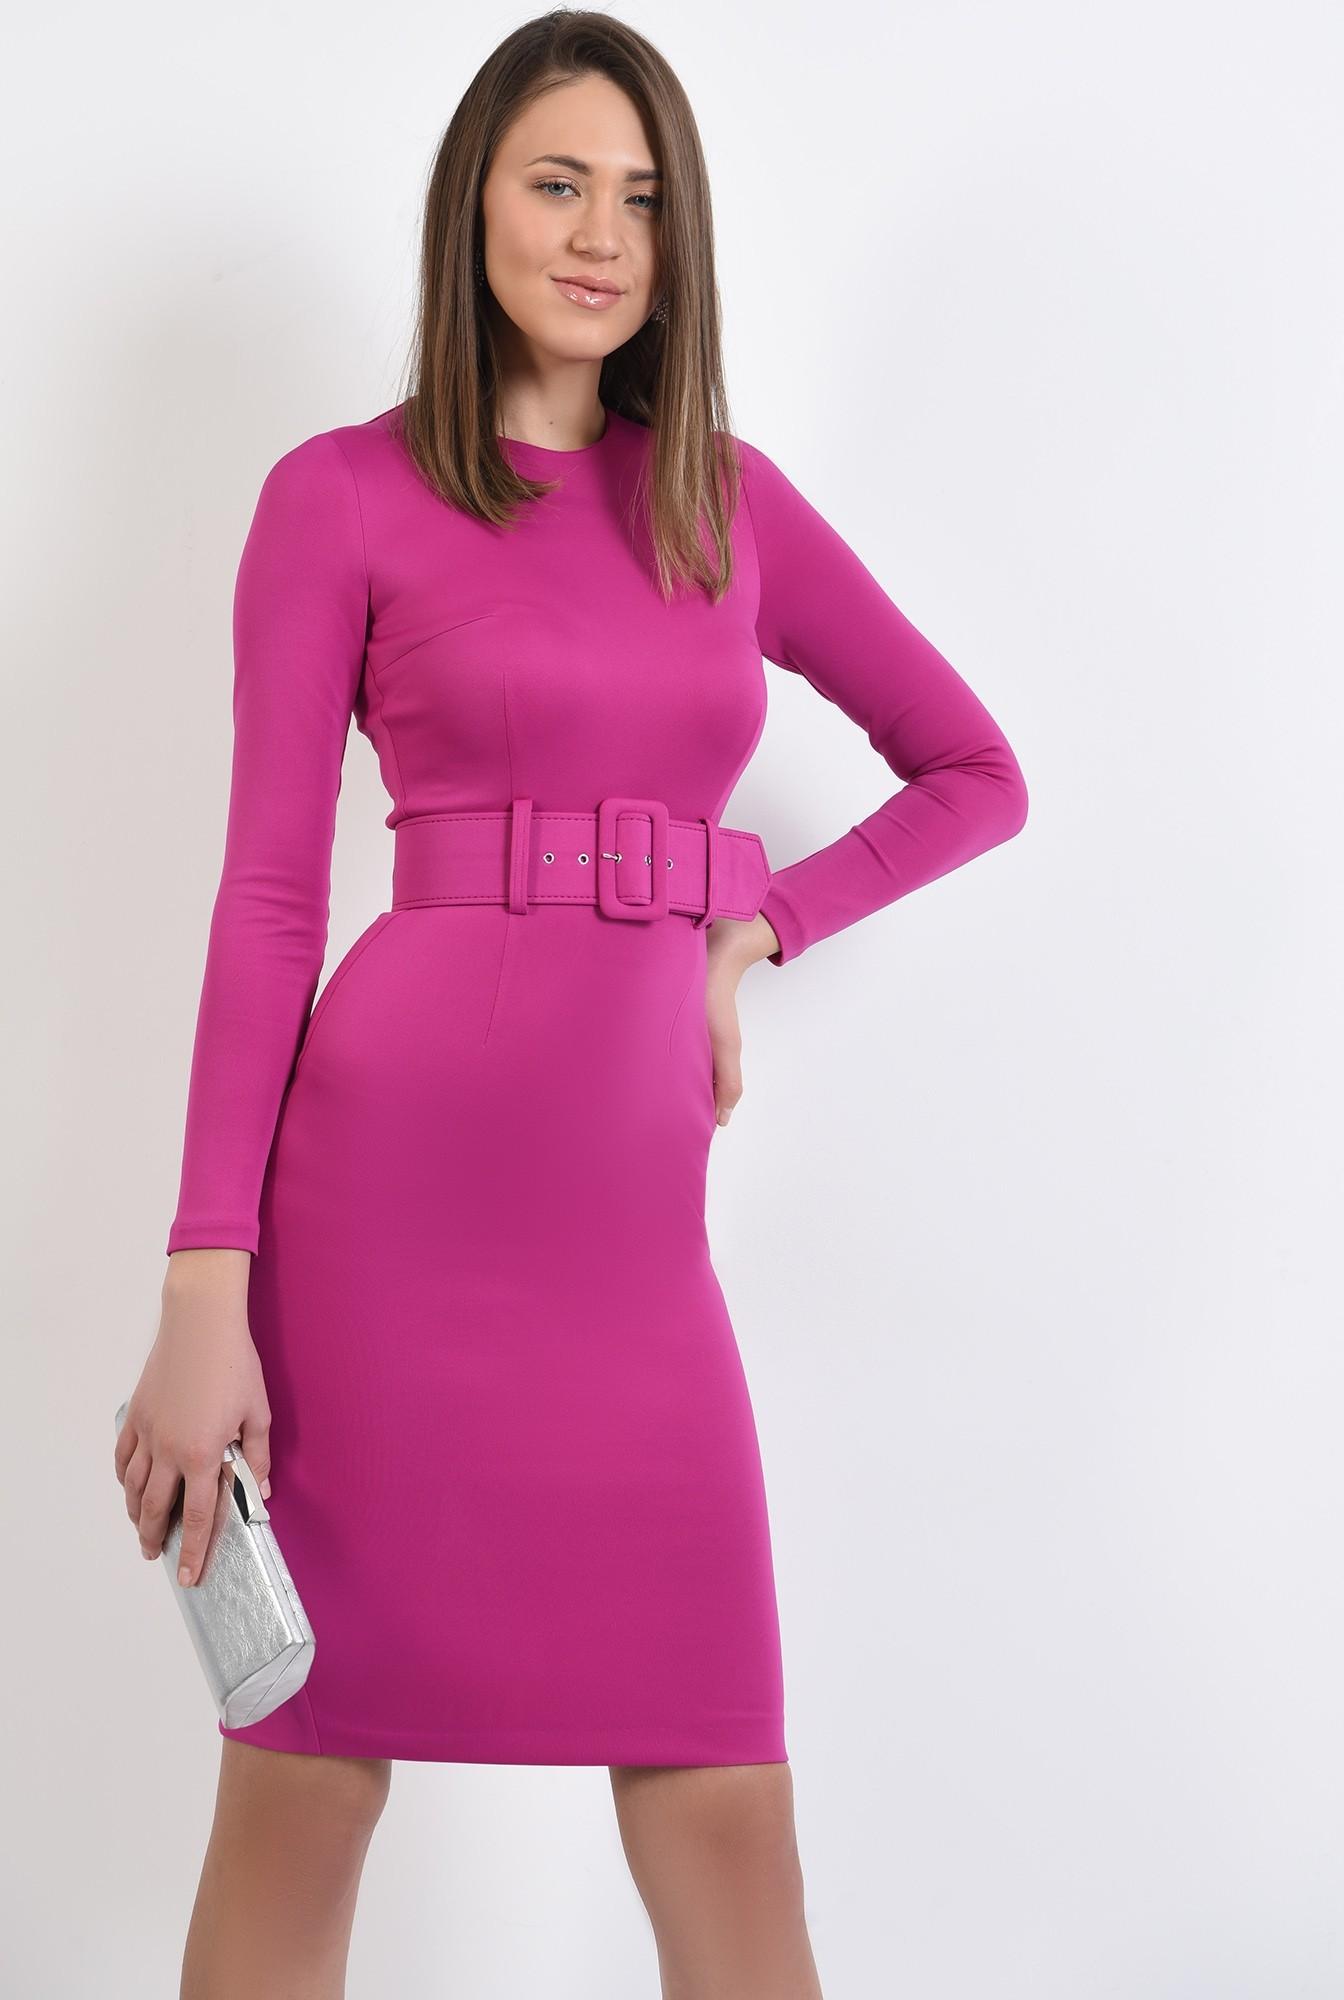 0 - 360 - rochie eleganta, midi, conica, cu centura, rochie de ocazie